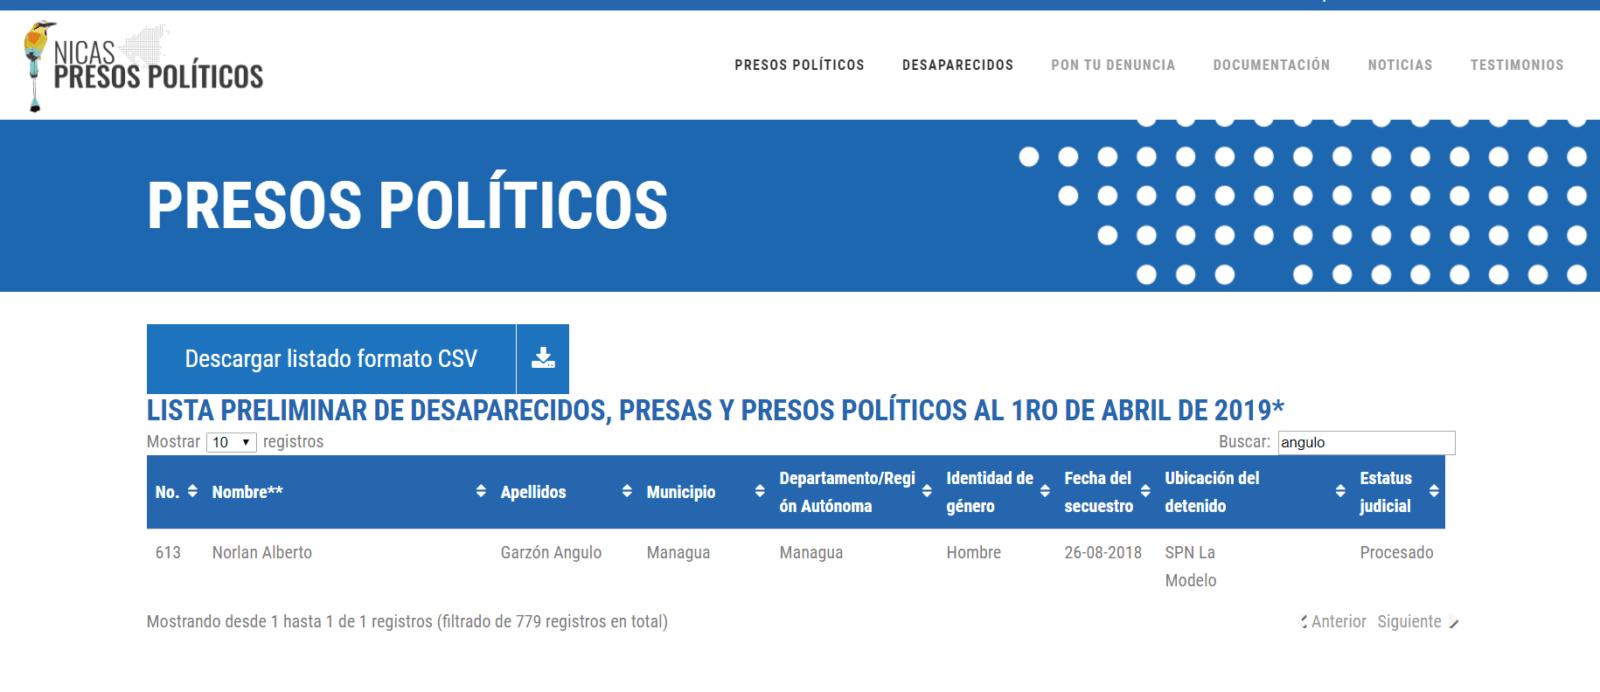 Nicaragua-political-prisoners-Norlan-Alberto-Garzon-Angulo